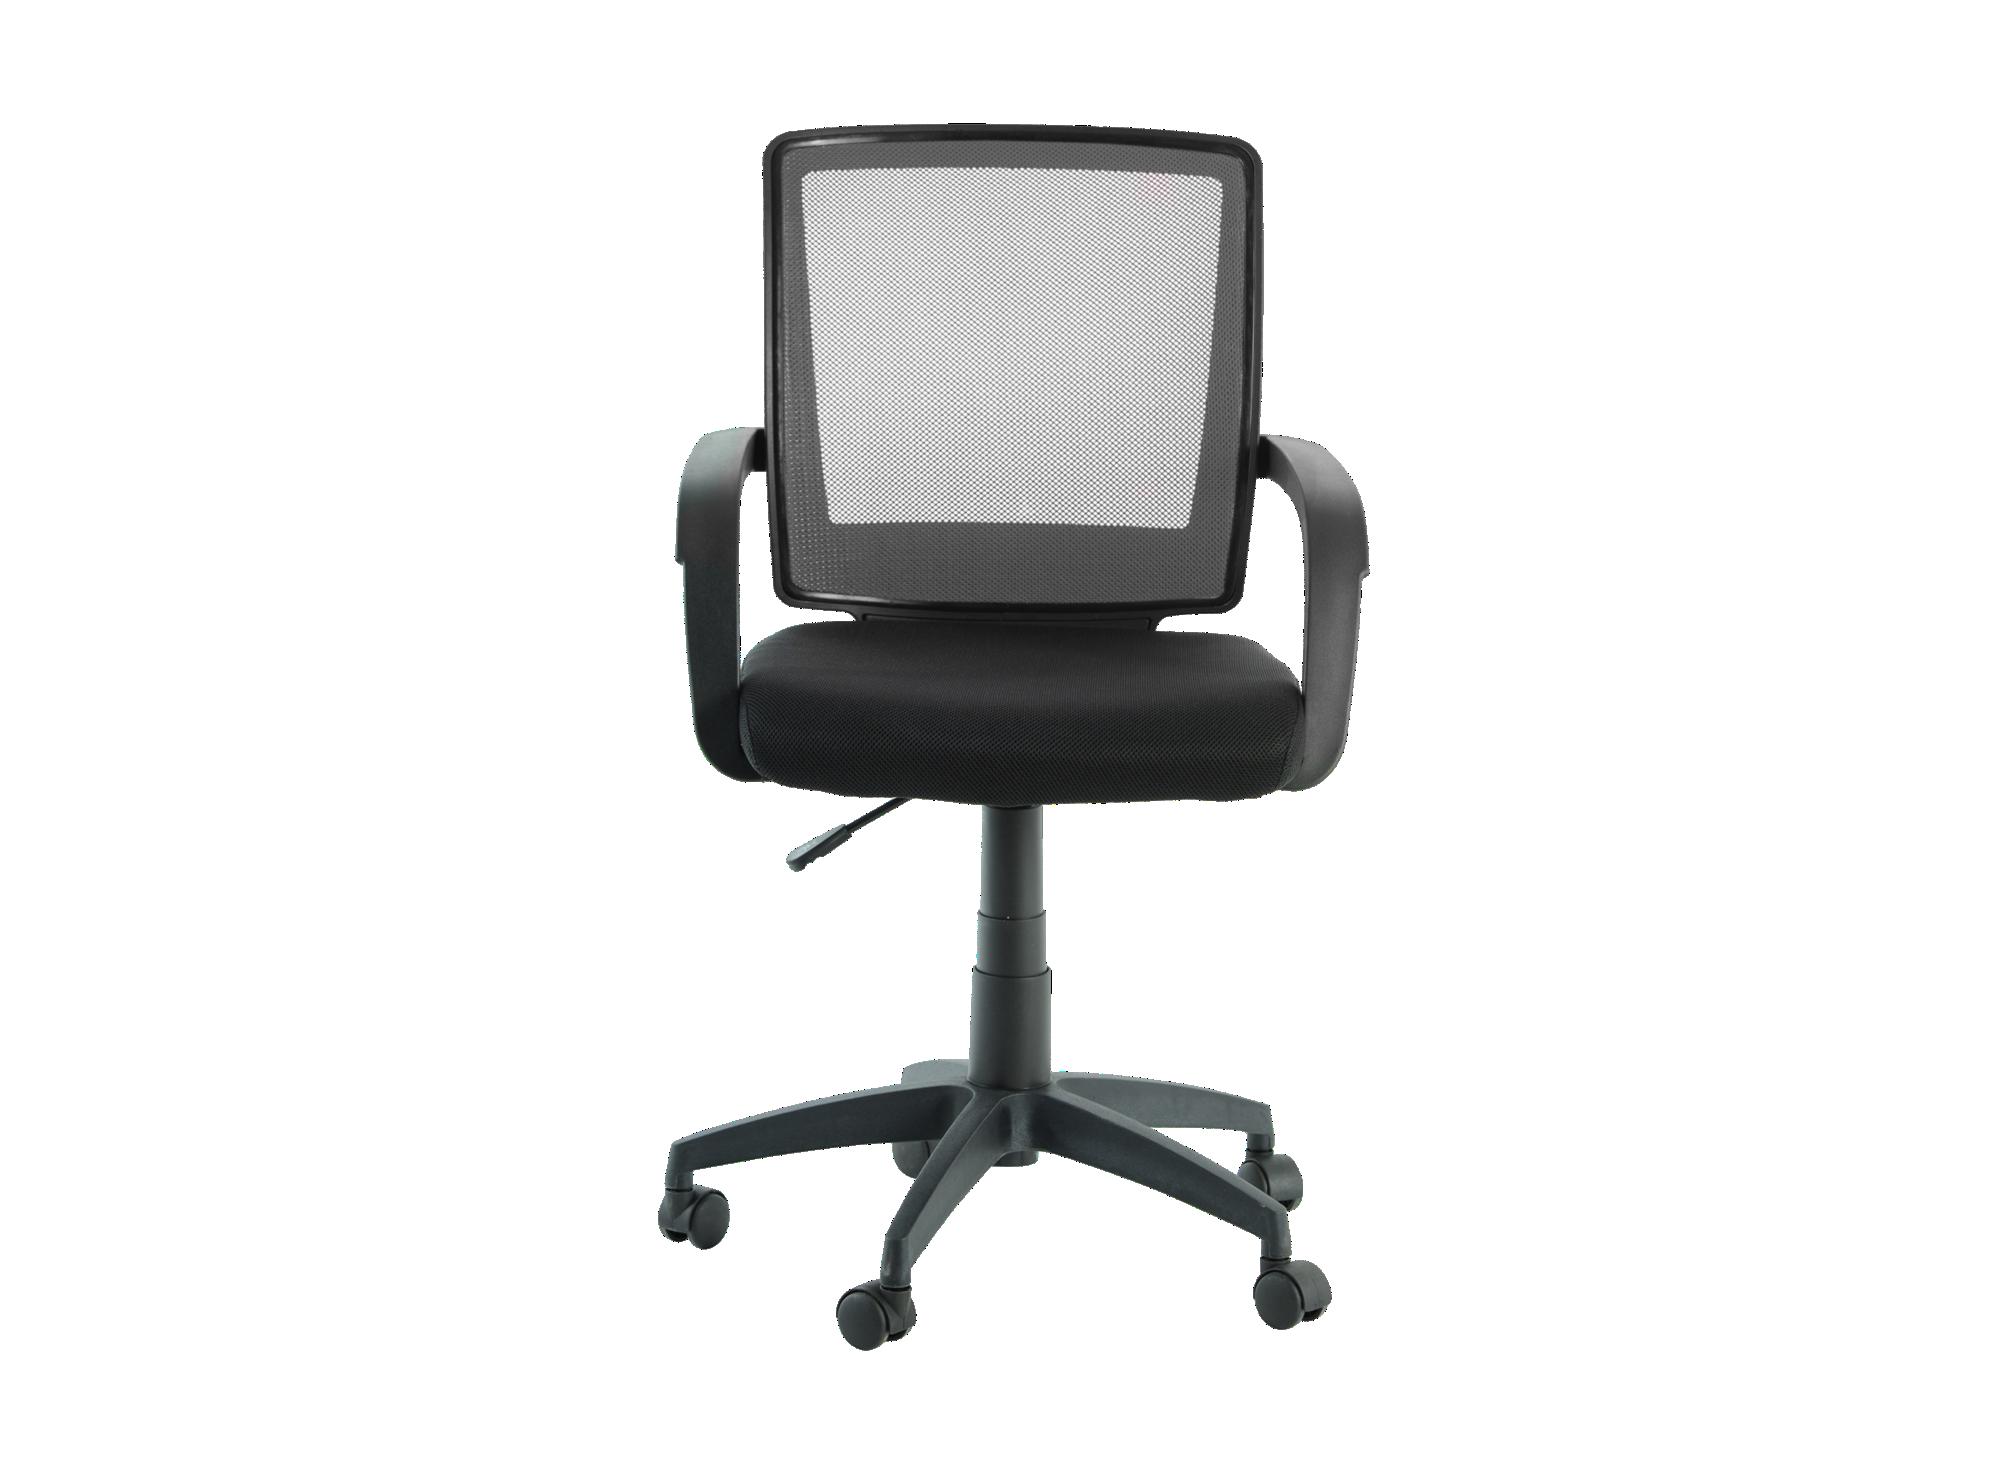 fauteuil bureau gris fly. Black Bedroom Furniture Sets. Home Design Ideas